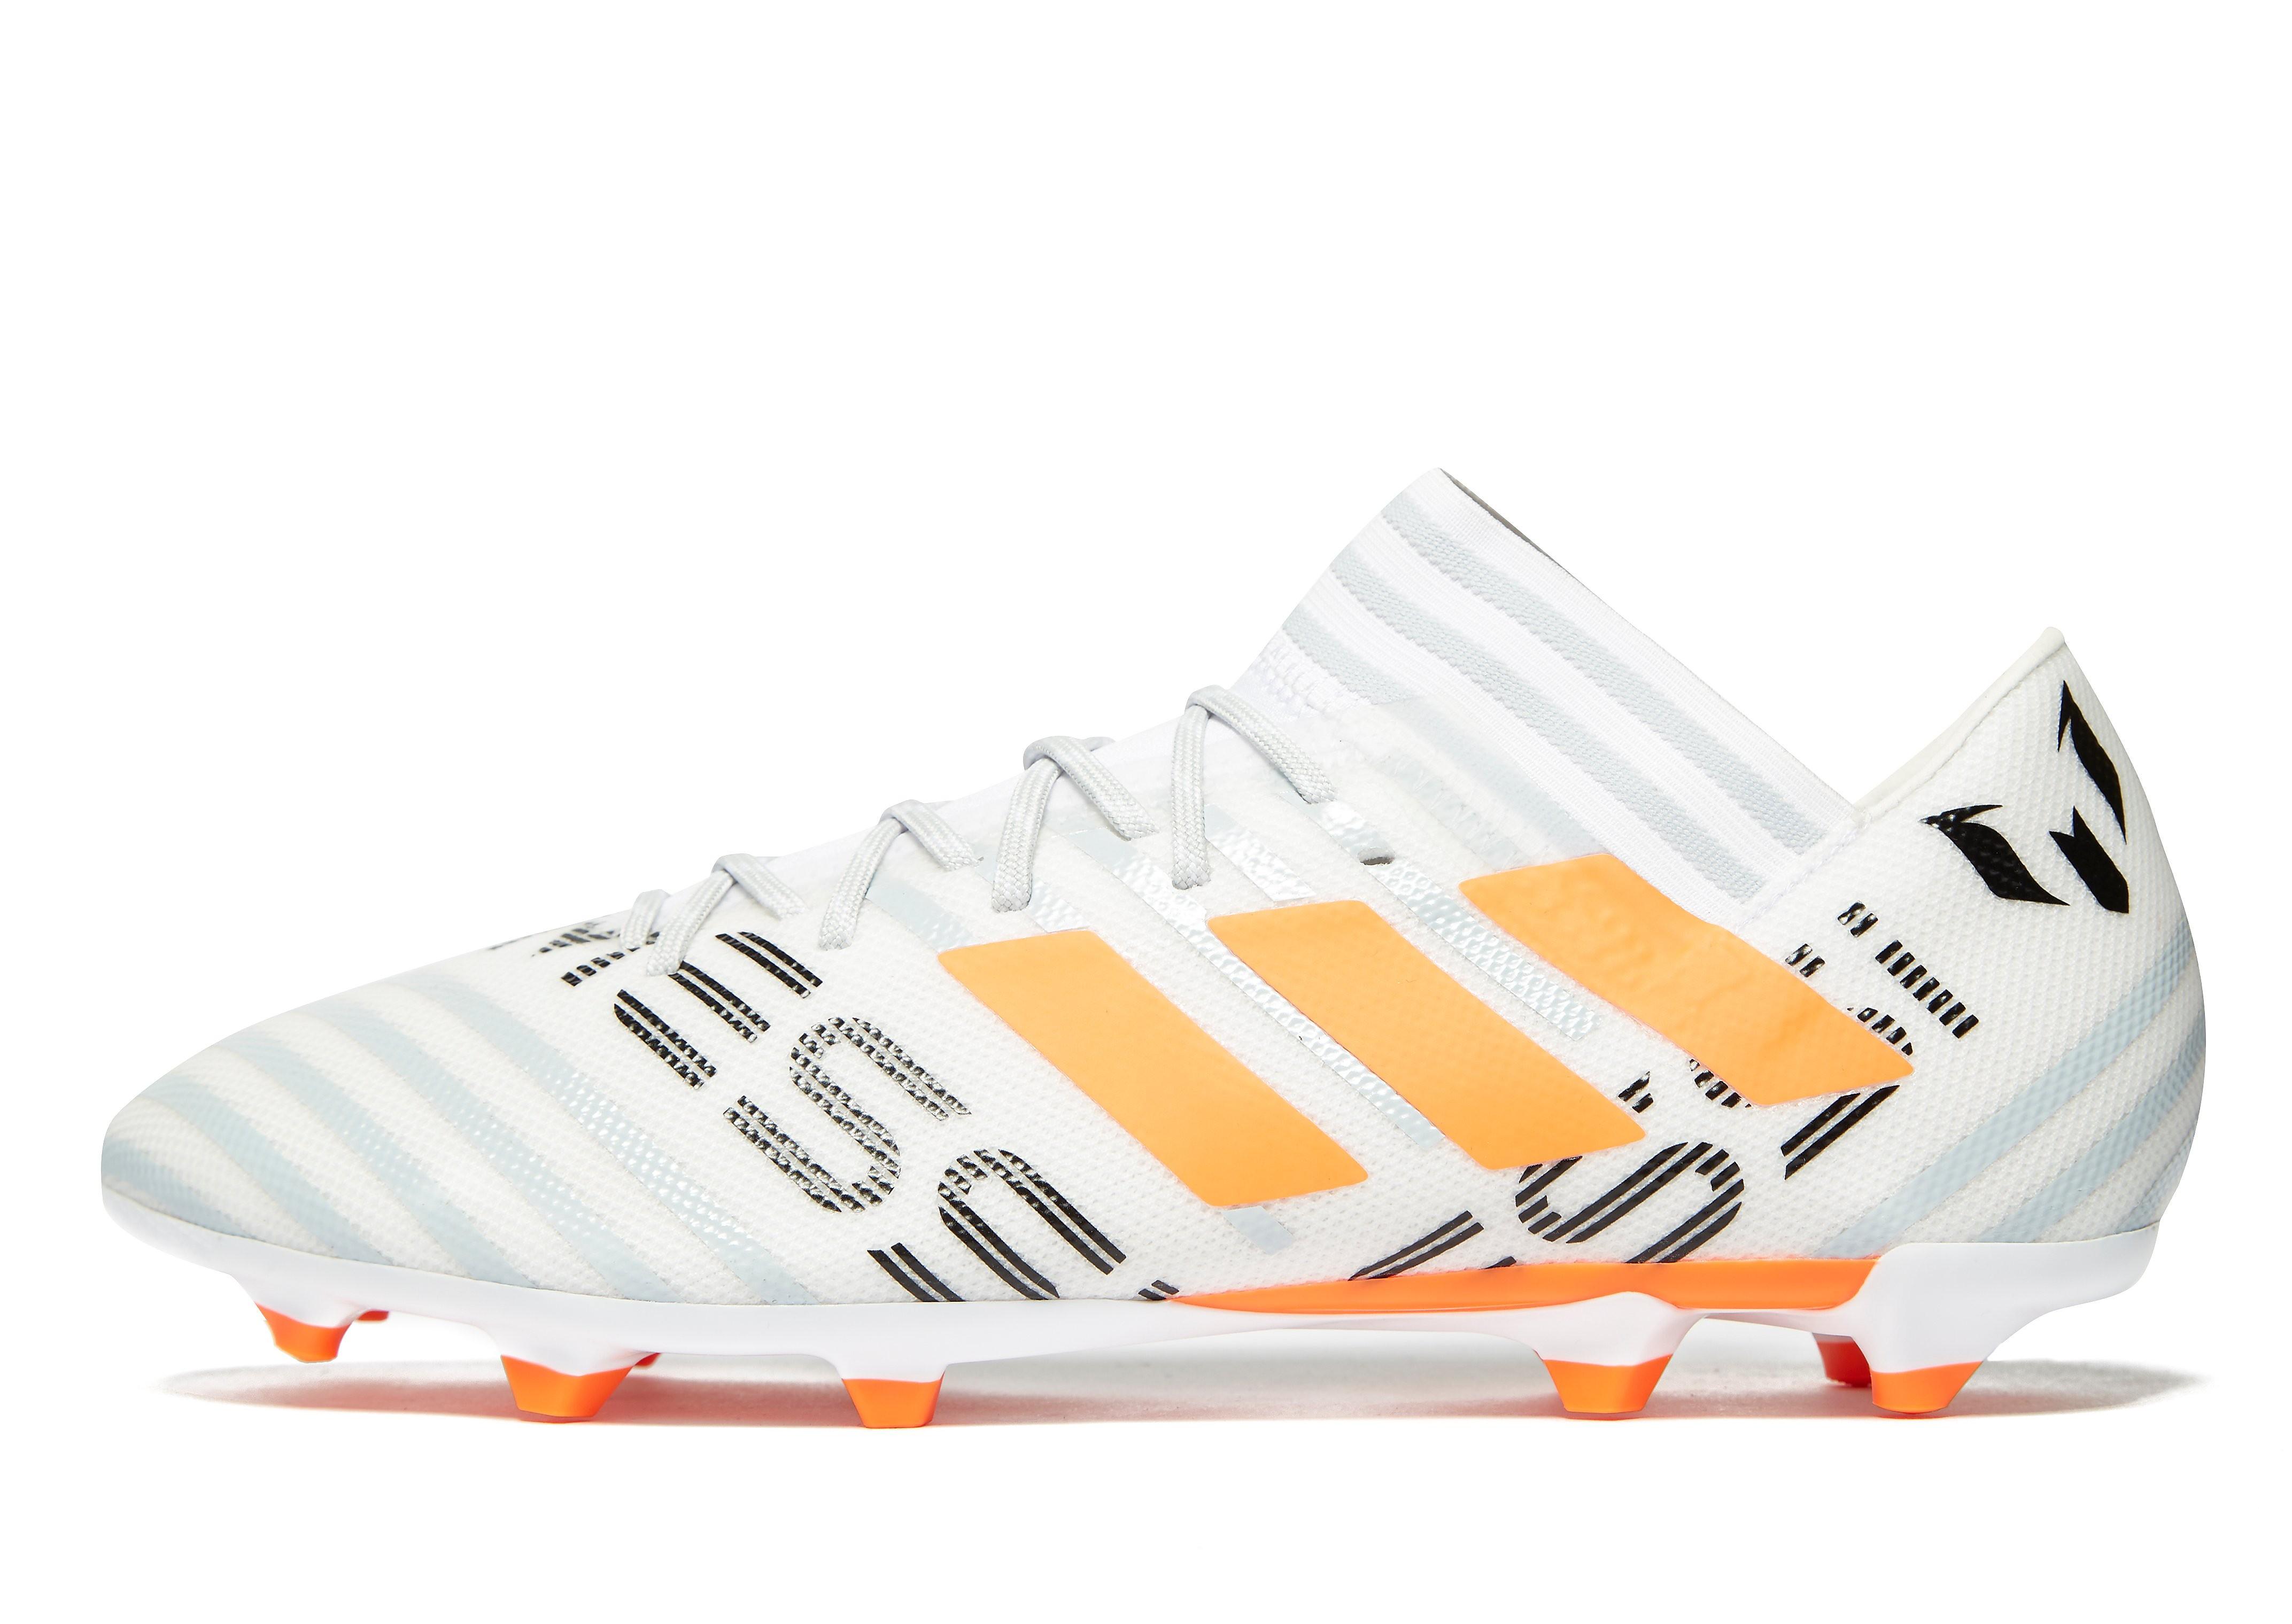 adidas Pyro Storm Nemeziz Messi 17.3 FG